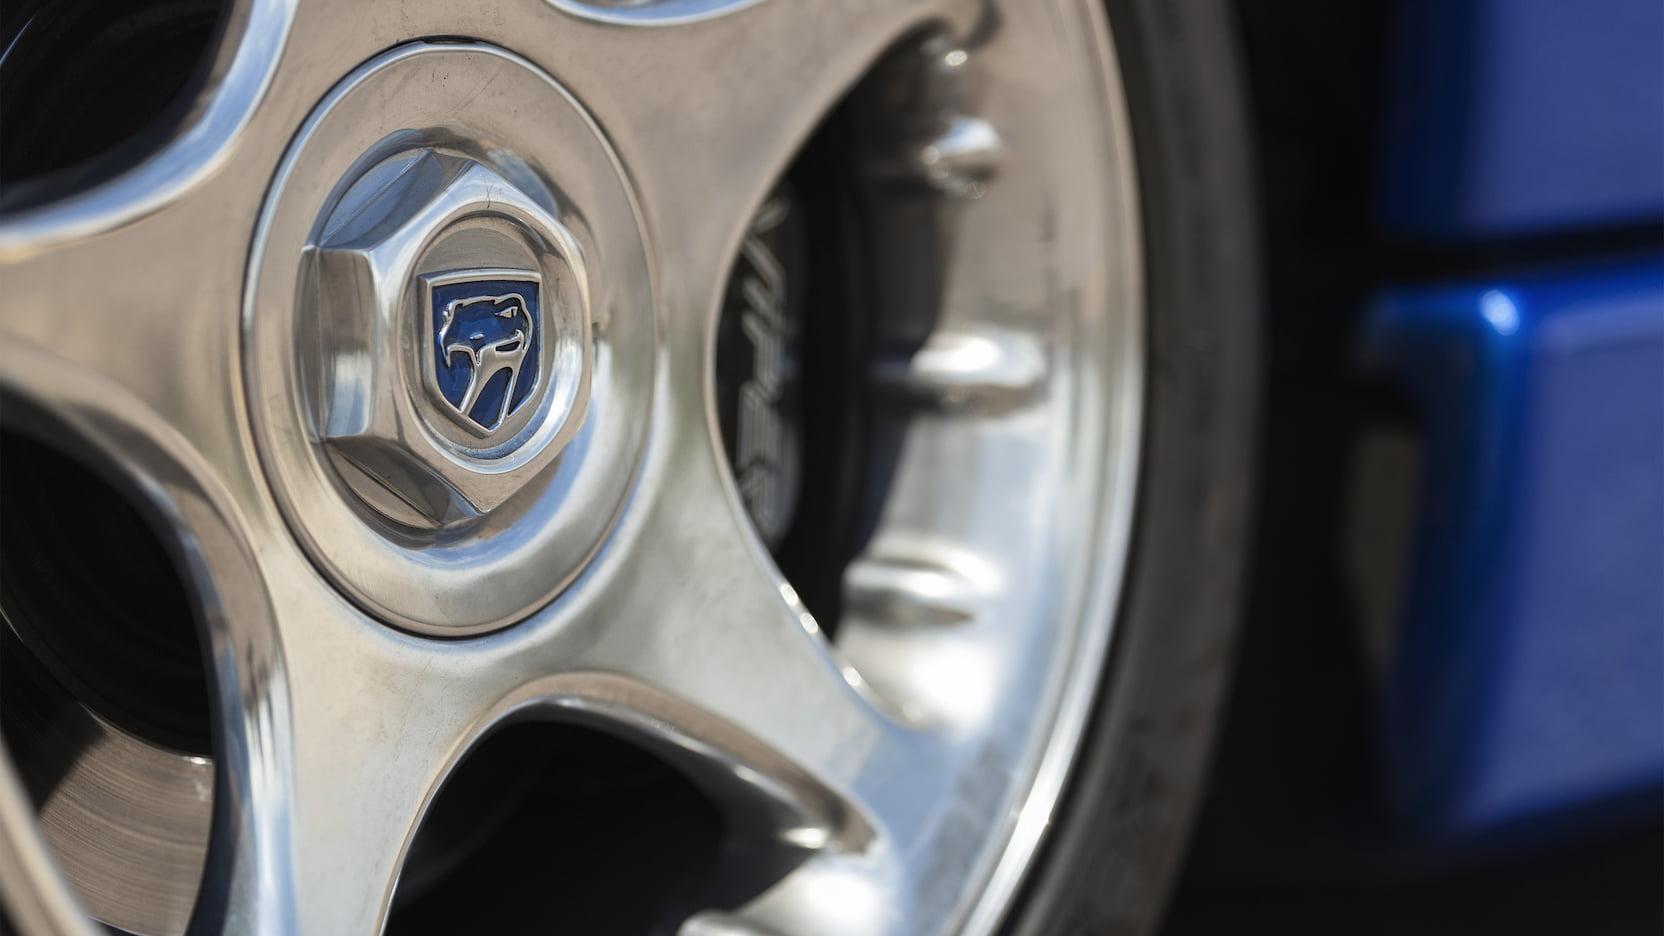 1996 Dodge Viper GTS wheel detail